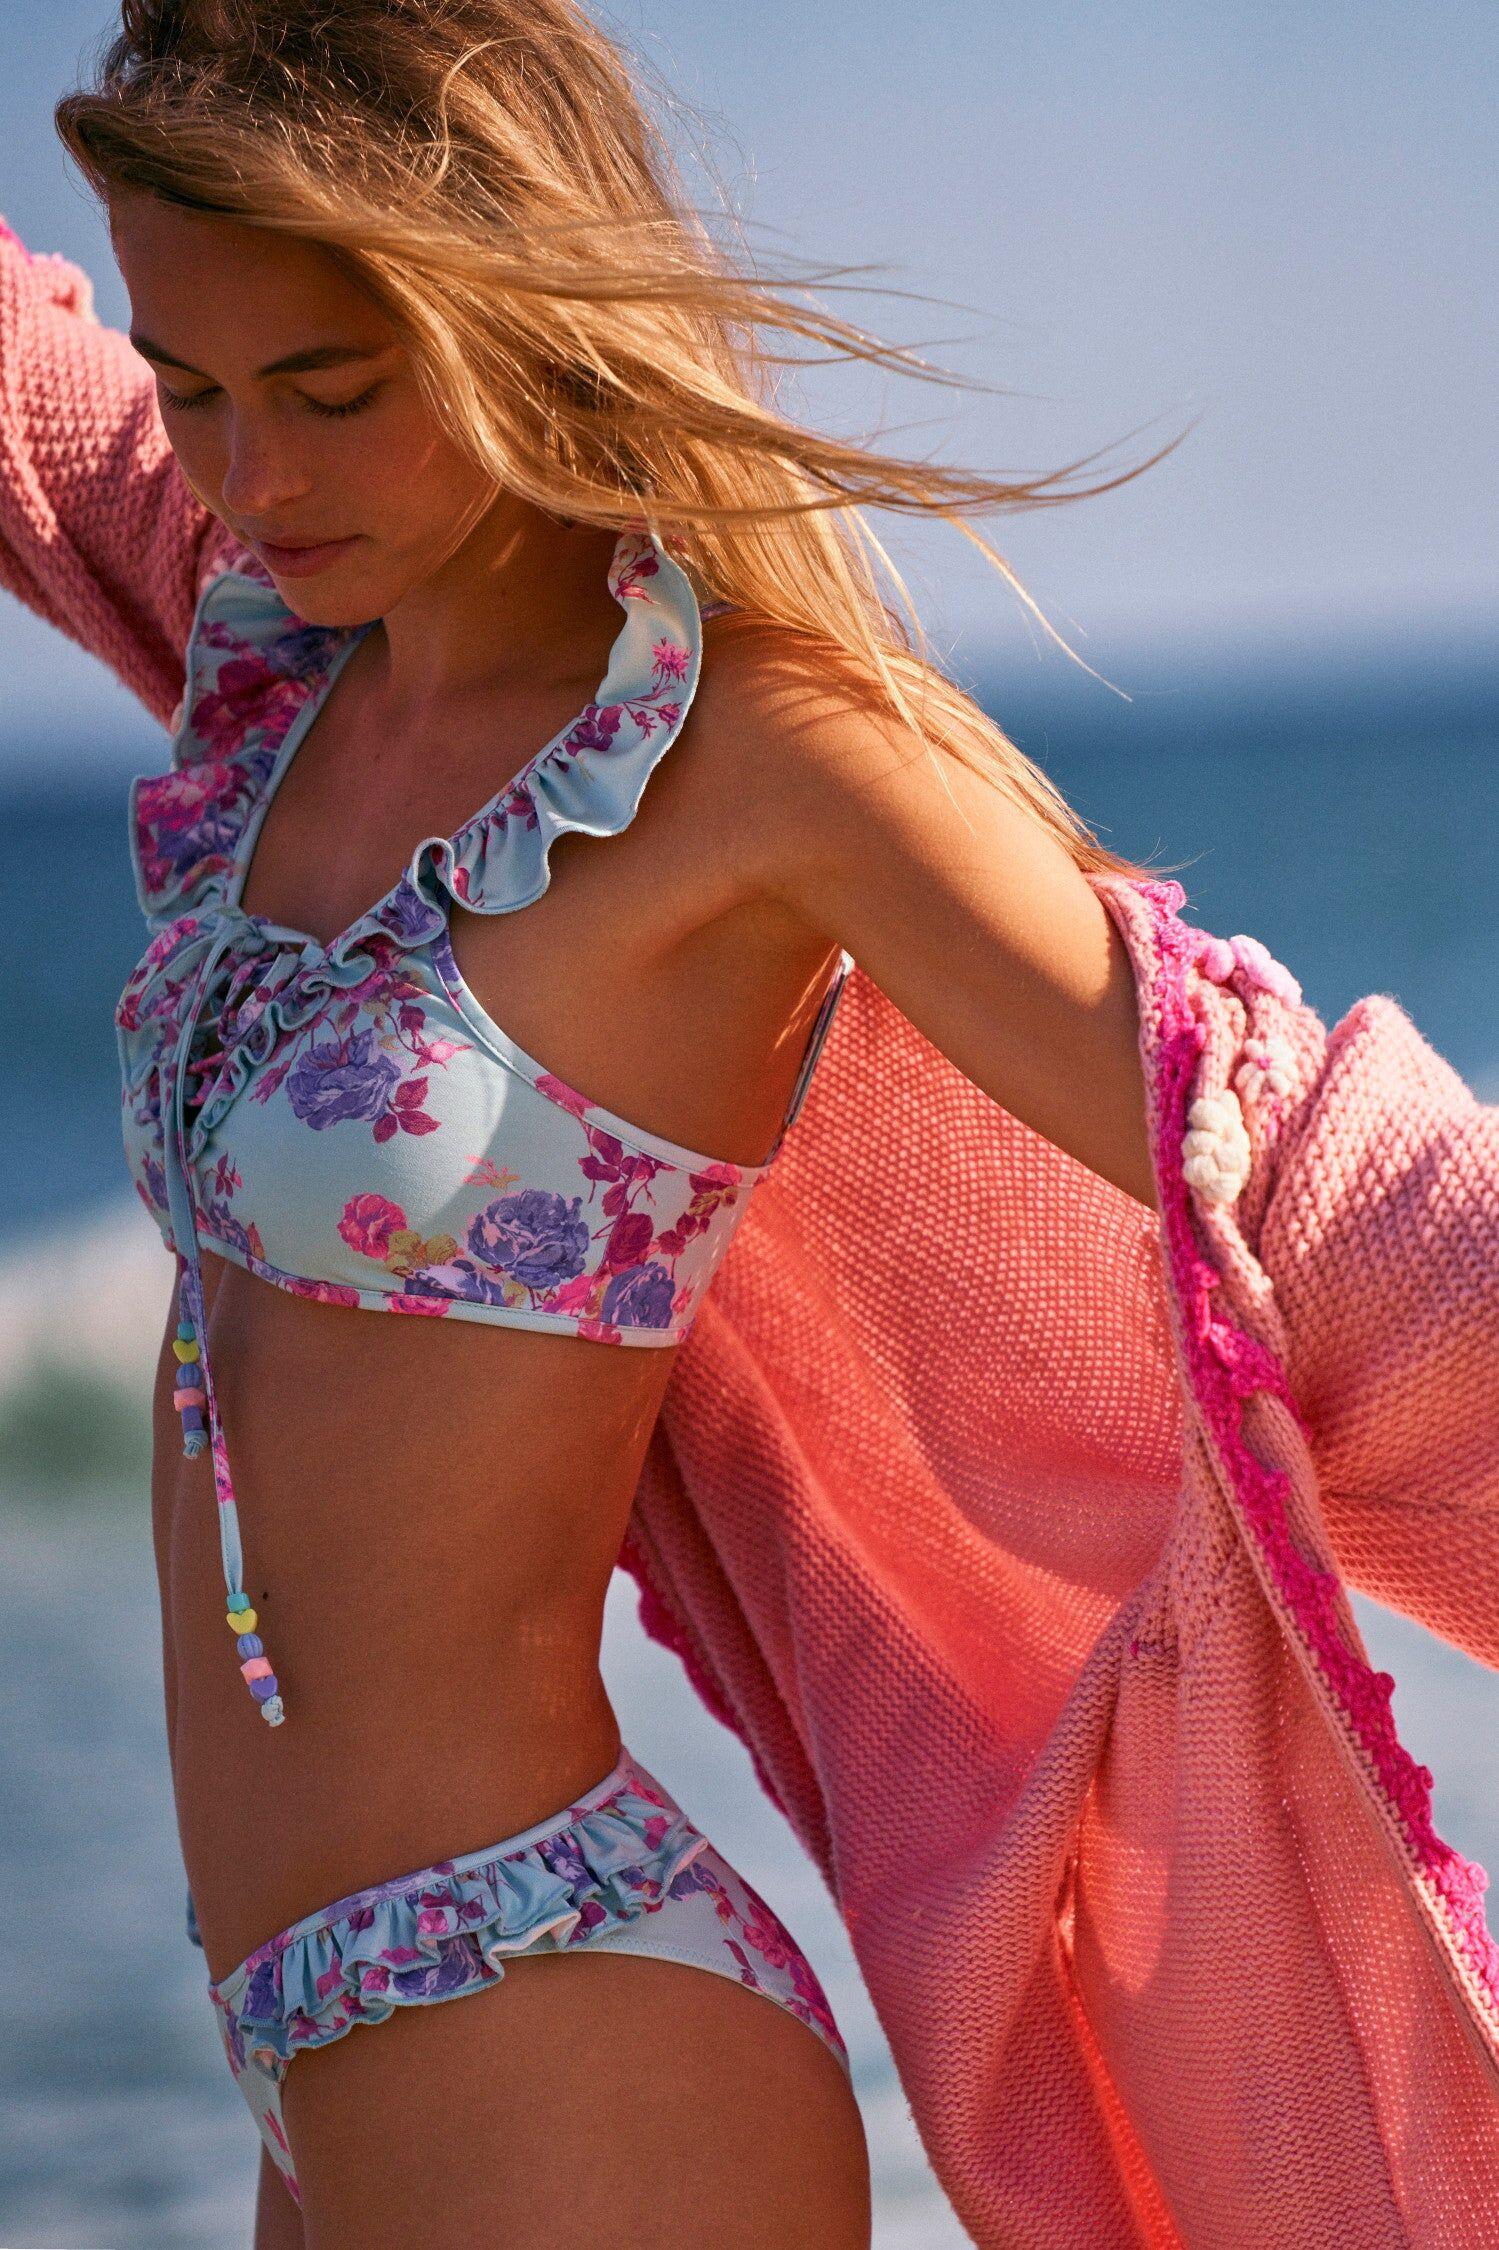 SHANGHAI FEI CHUAN IMP. & Women's Frost Bikini Set